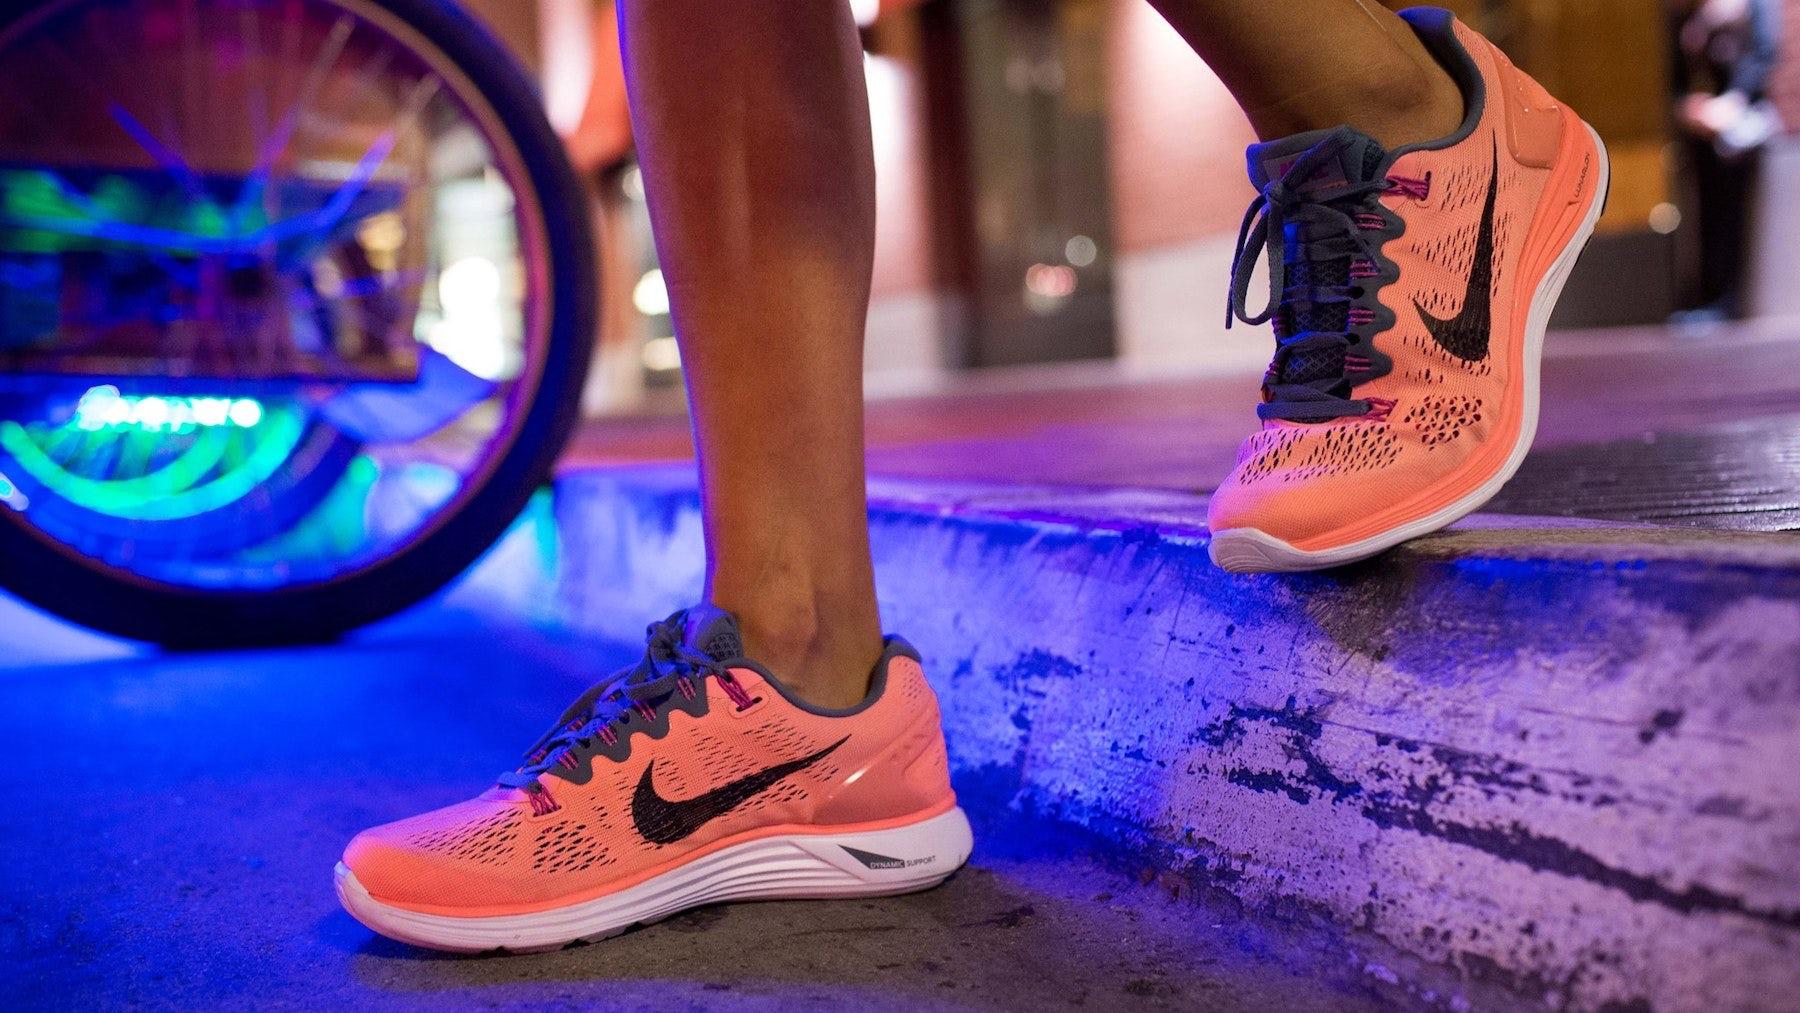 Nike's LunarGlide+ 5 trainers | Source: Nike